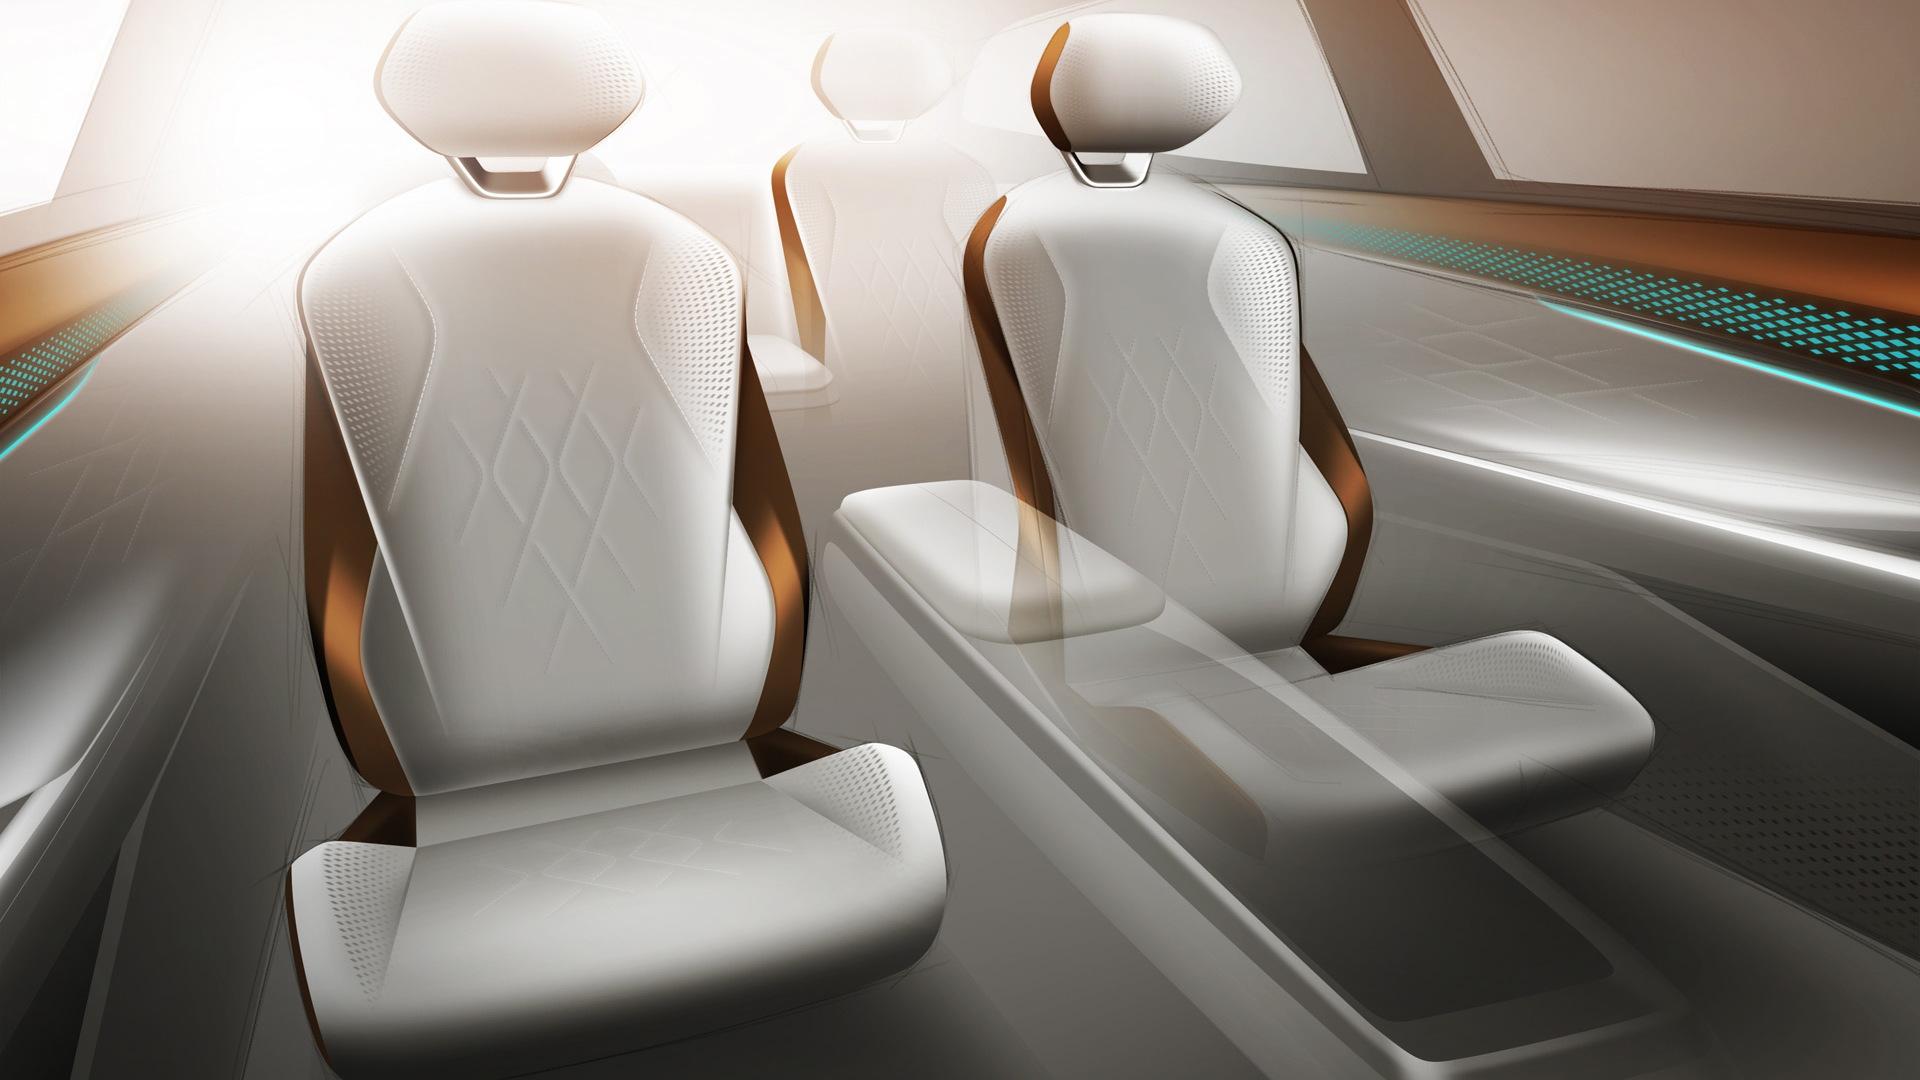 Teaser for Volkswagen ID Space Vizzion concept debuting on November 19, 2019